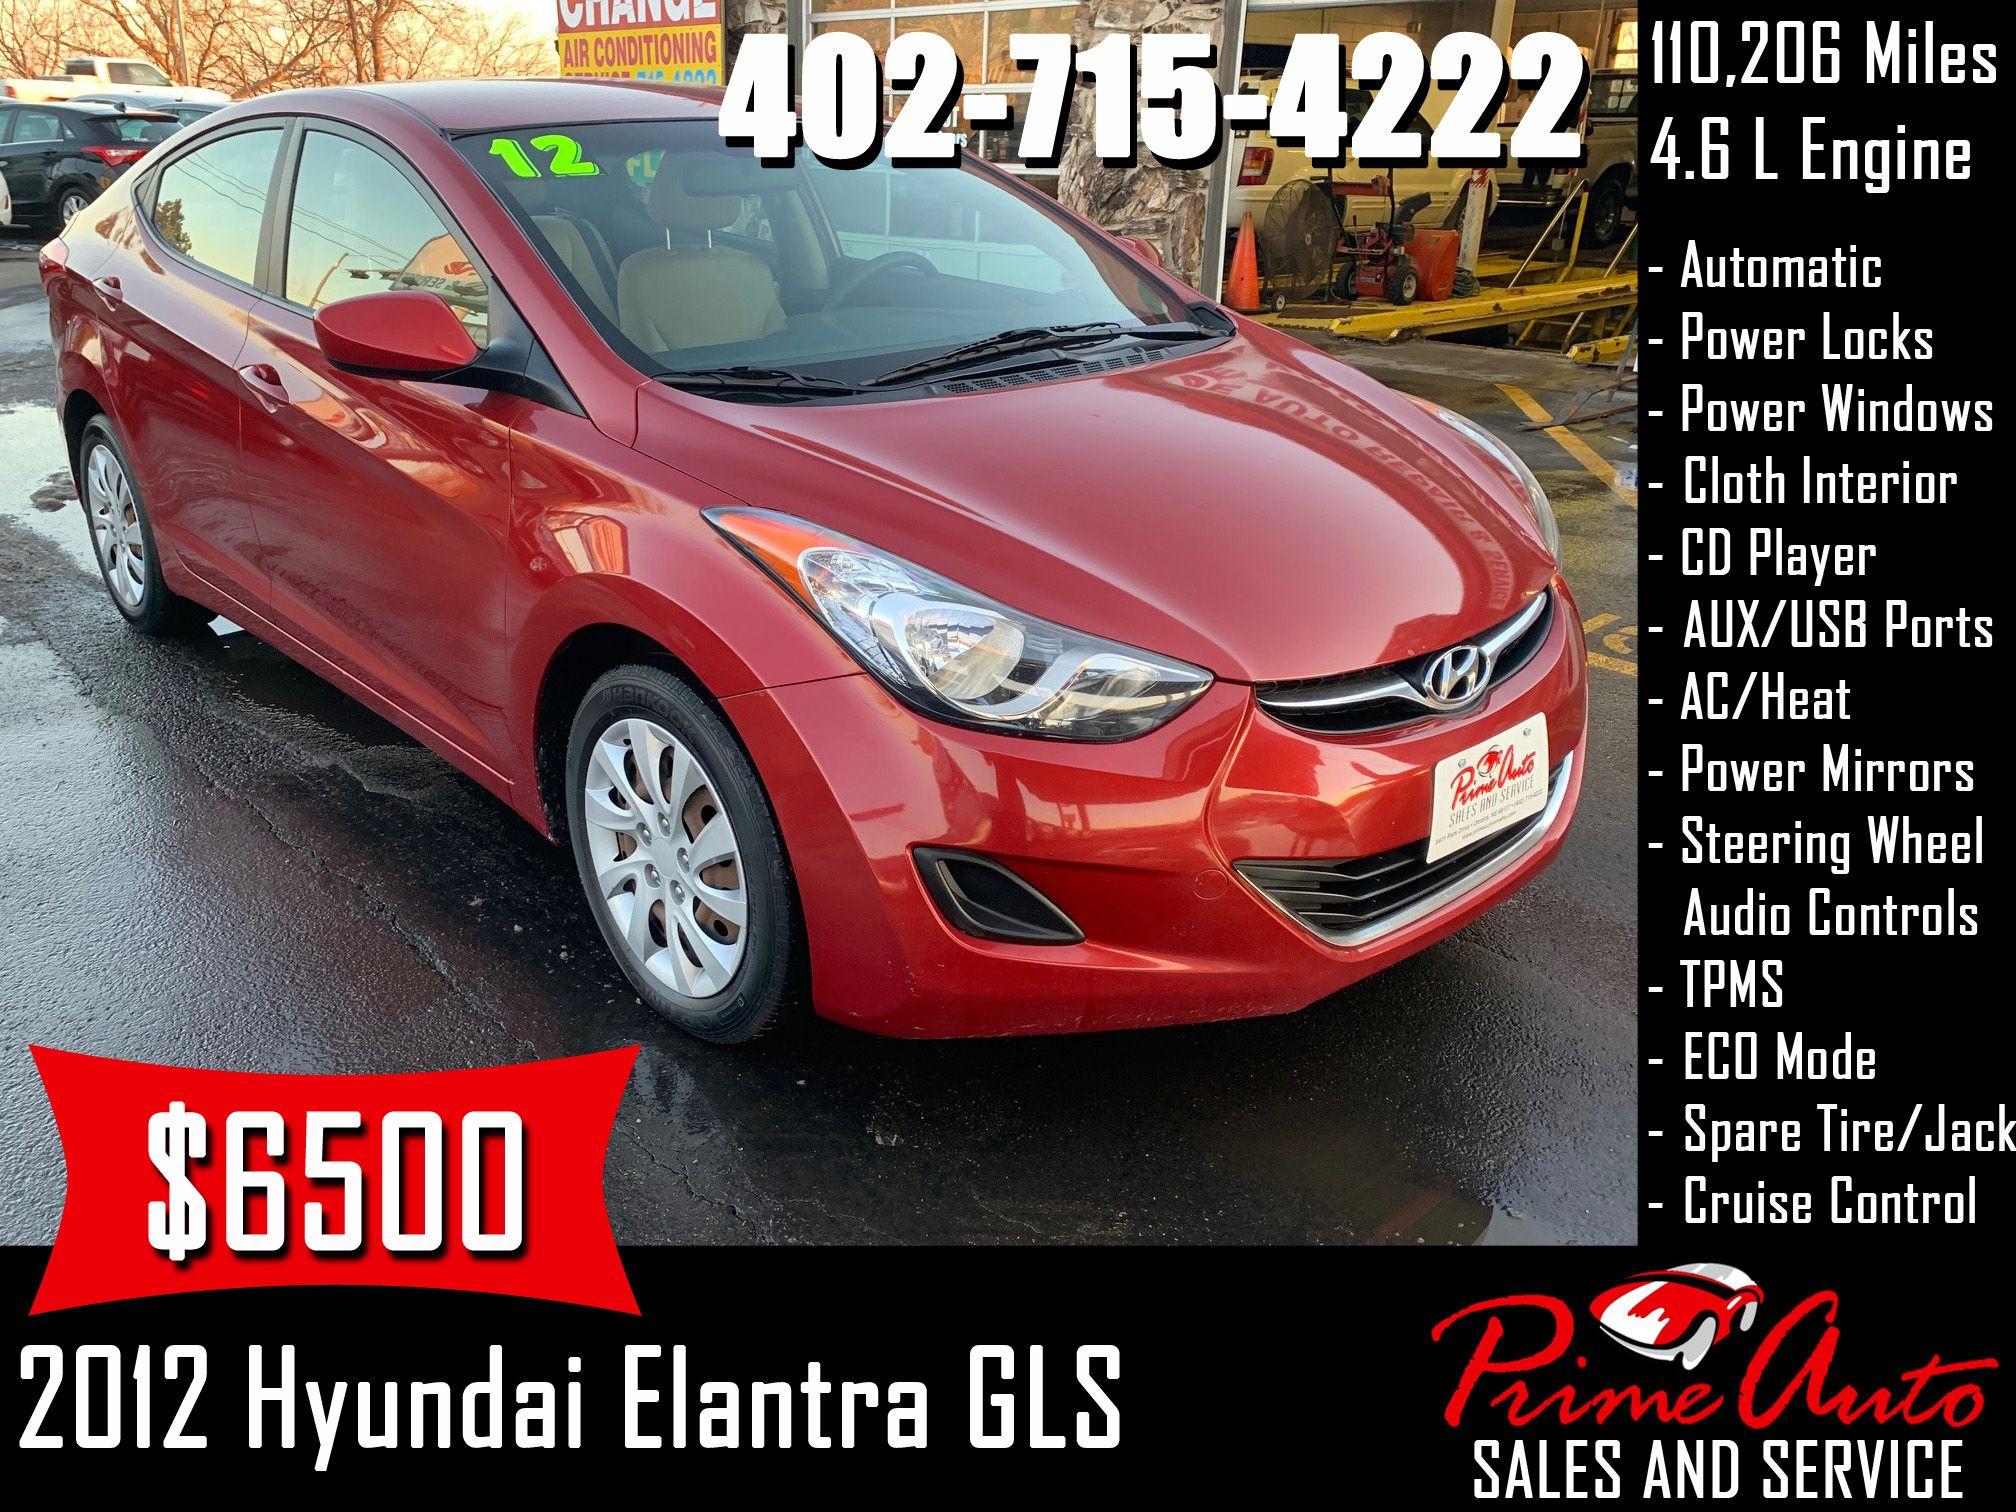 2012 Hyundai Elantra Gls Call Us Today 402 715 4222 Hyundai Elantra Gls Cars Auto Omaha Carsforsale Buyme Primea Hyundai Elantra Hyundai Elantra